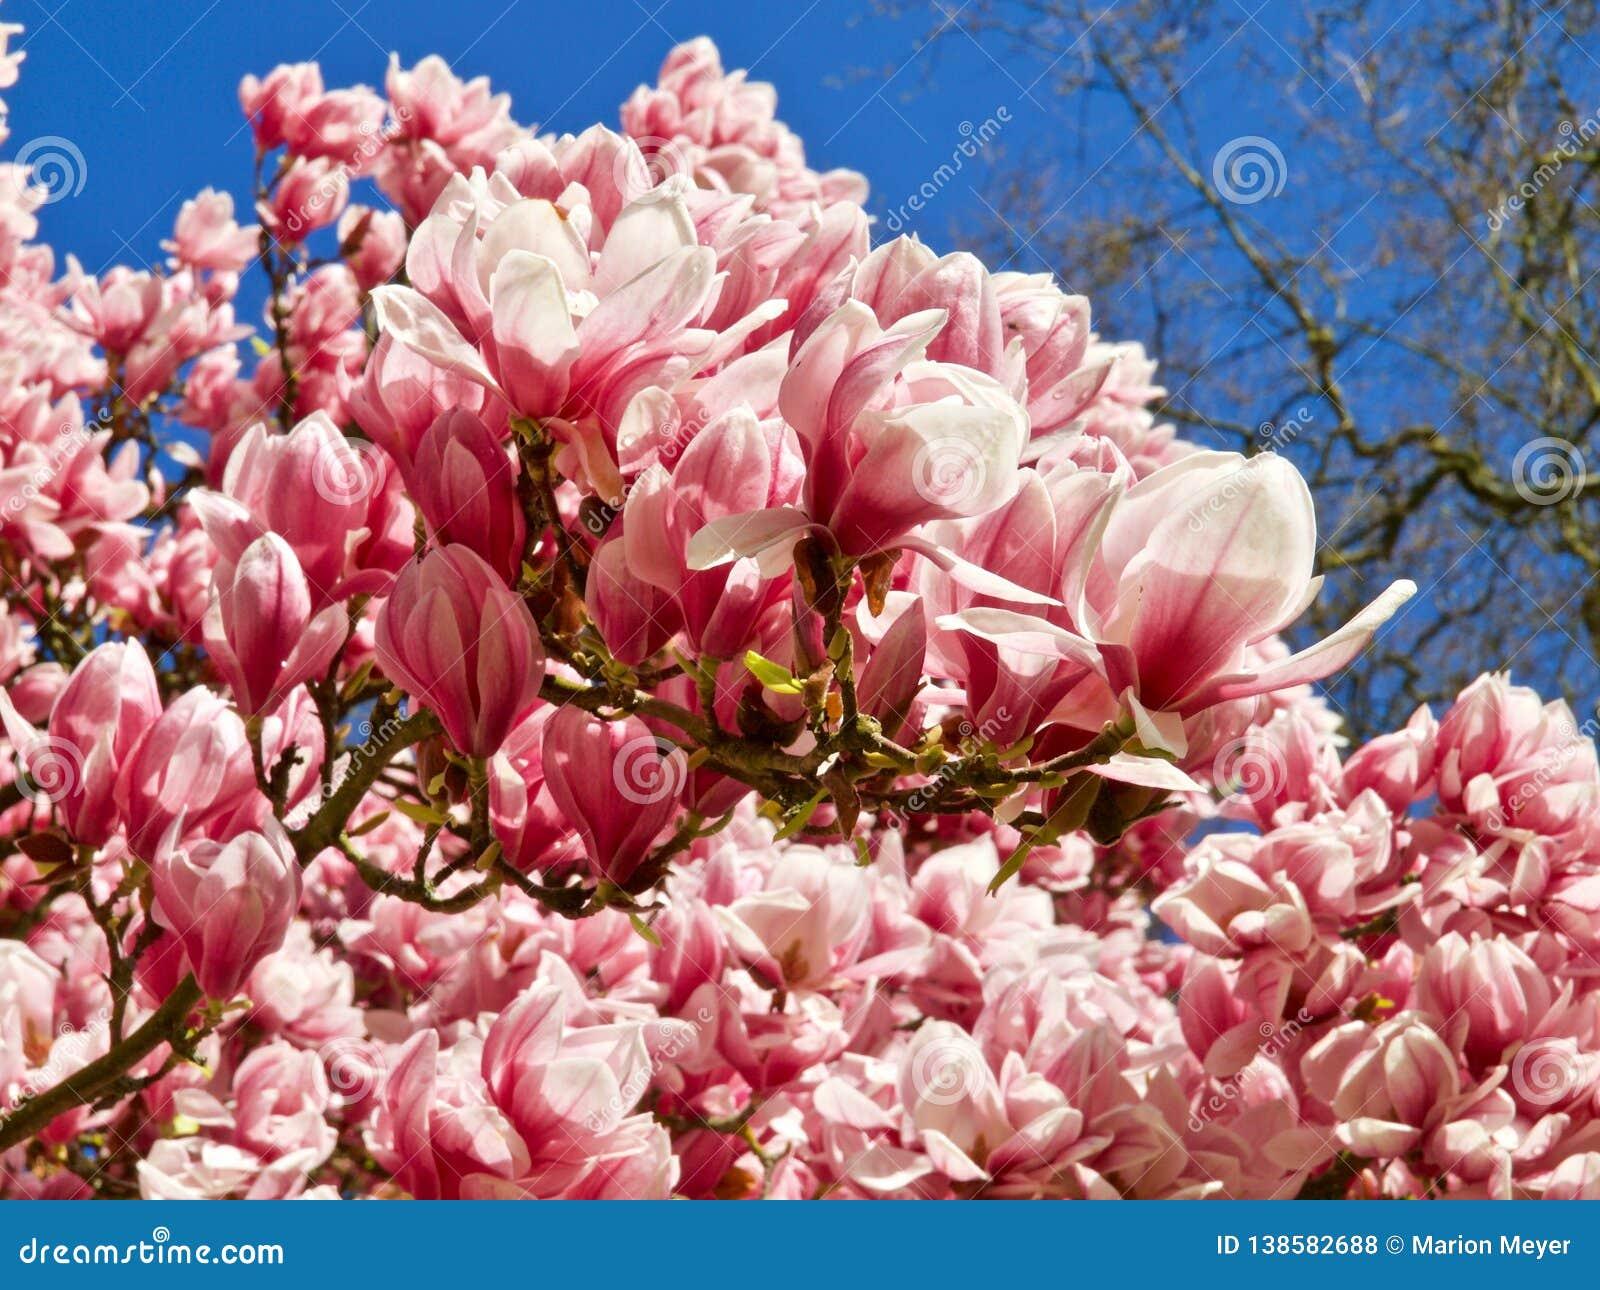 Huge Pink Blooming Magnolia Tree Stock Photo Image Of Bush